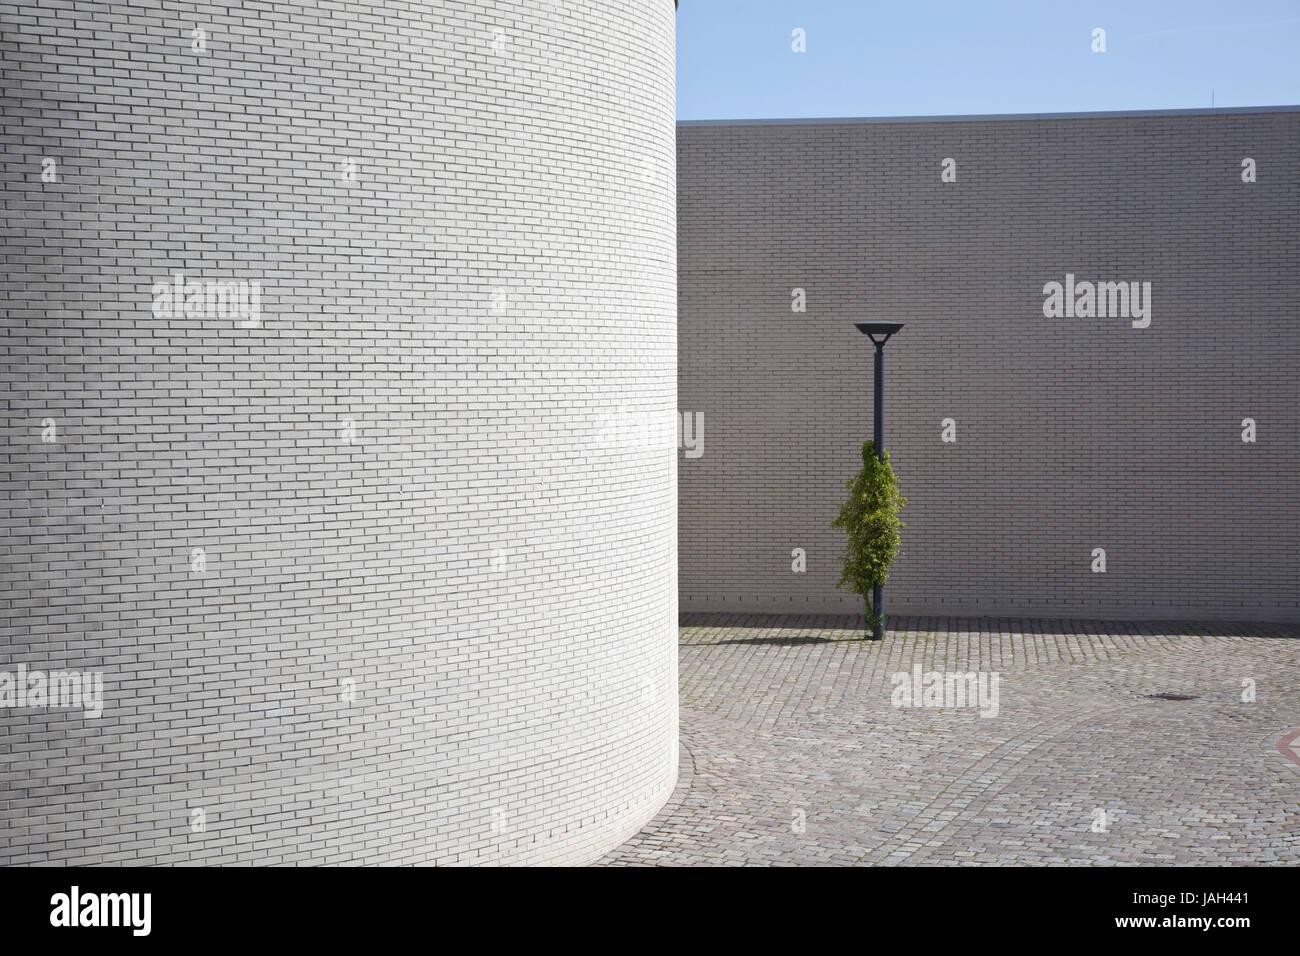 Germany,North Germany,the North Sea,North Sea coast,Bremen,Bremerhaven,Hanseatic town,navigation museum, - Stock Image